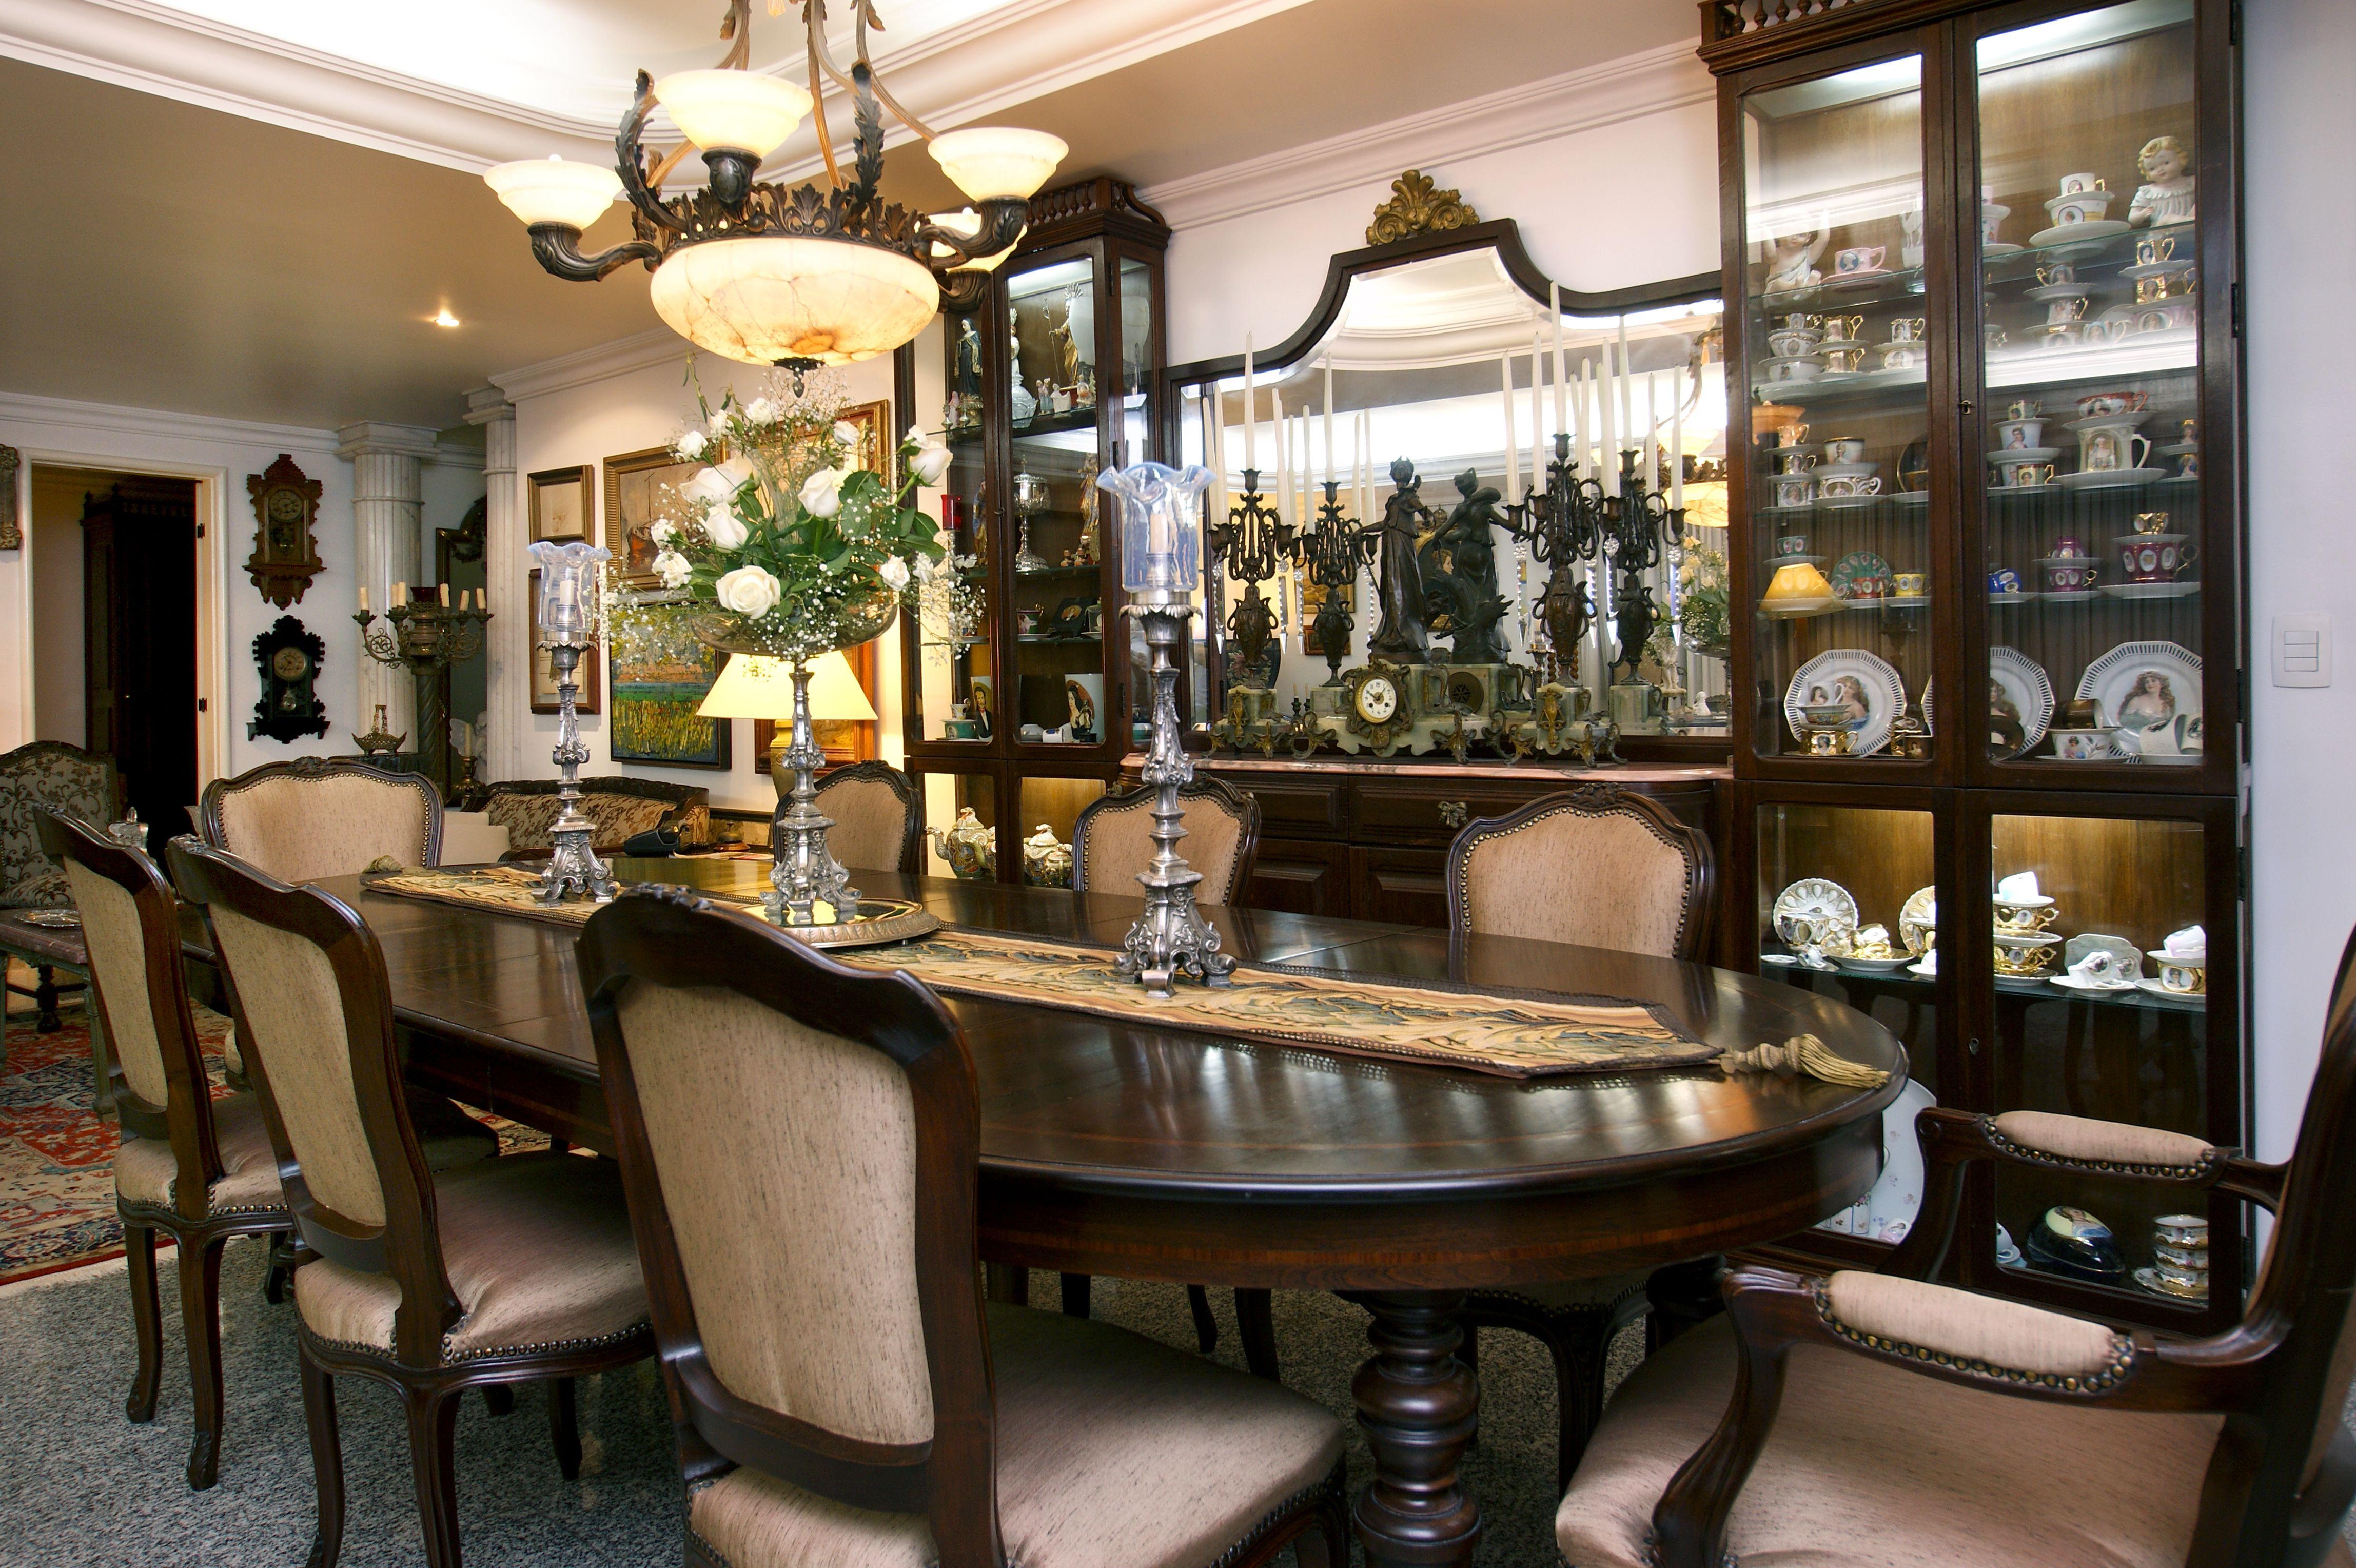 Sala De Jantar Cl Ssica Projetos By Celene Gurgel Pinterest -> Sala De Jantar Atlanta